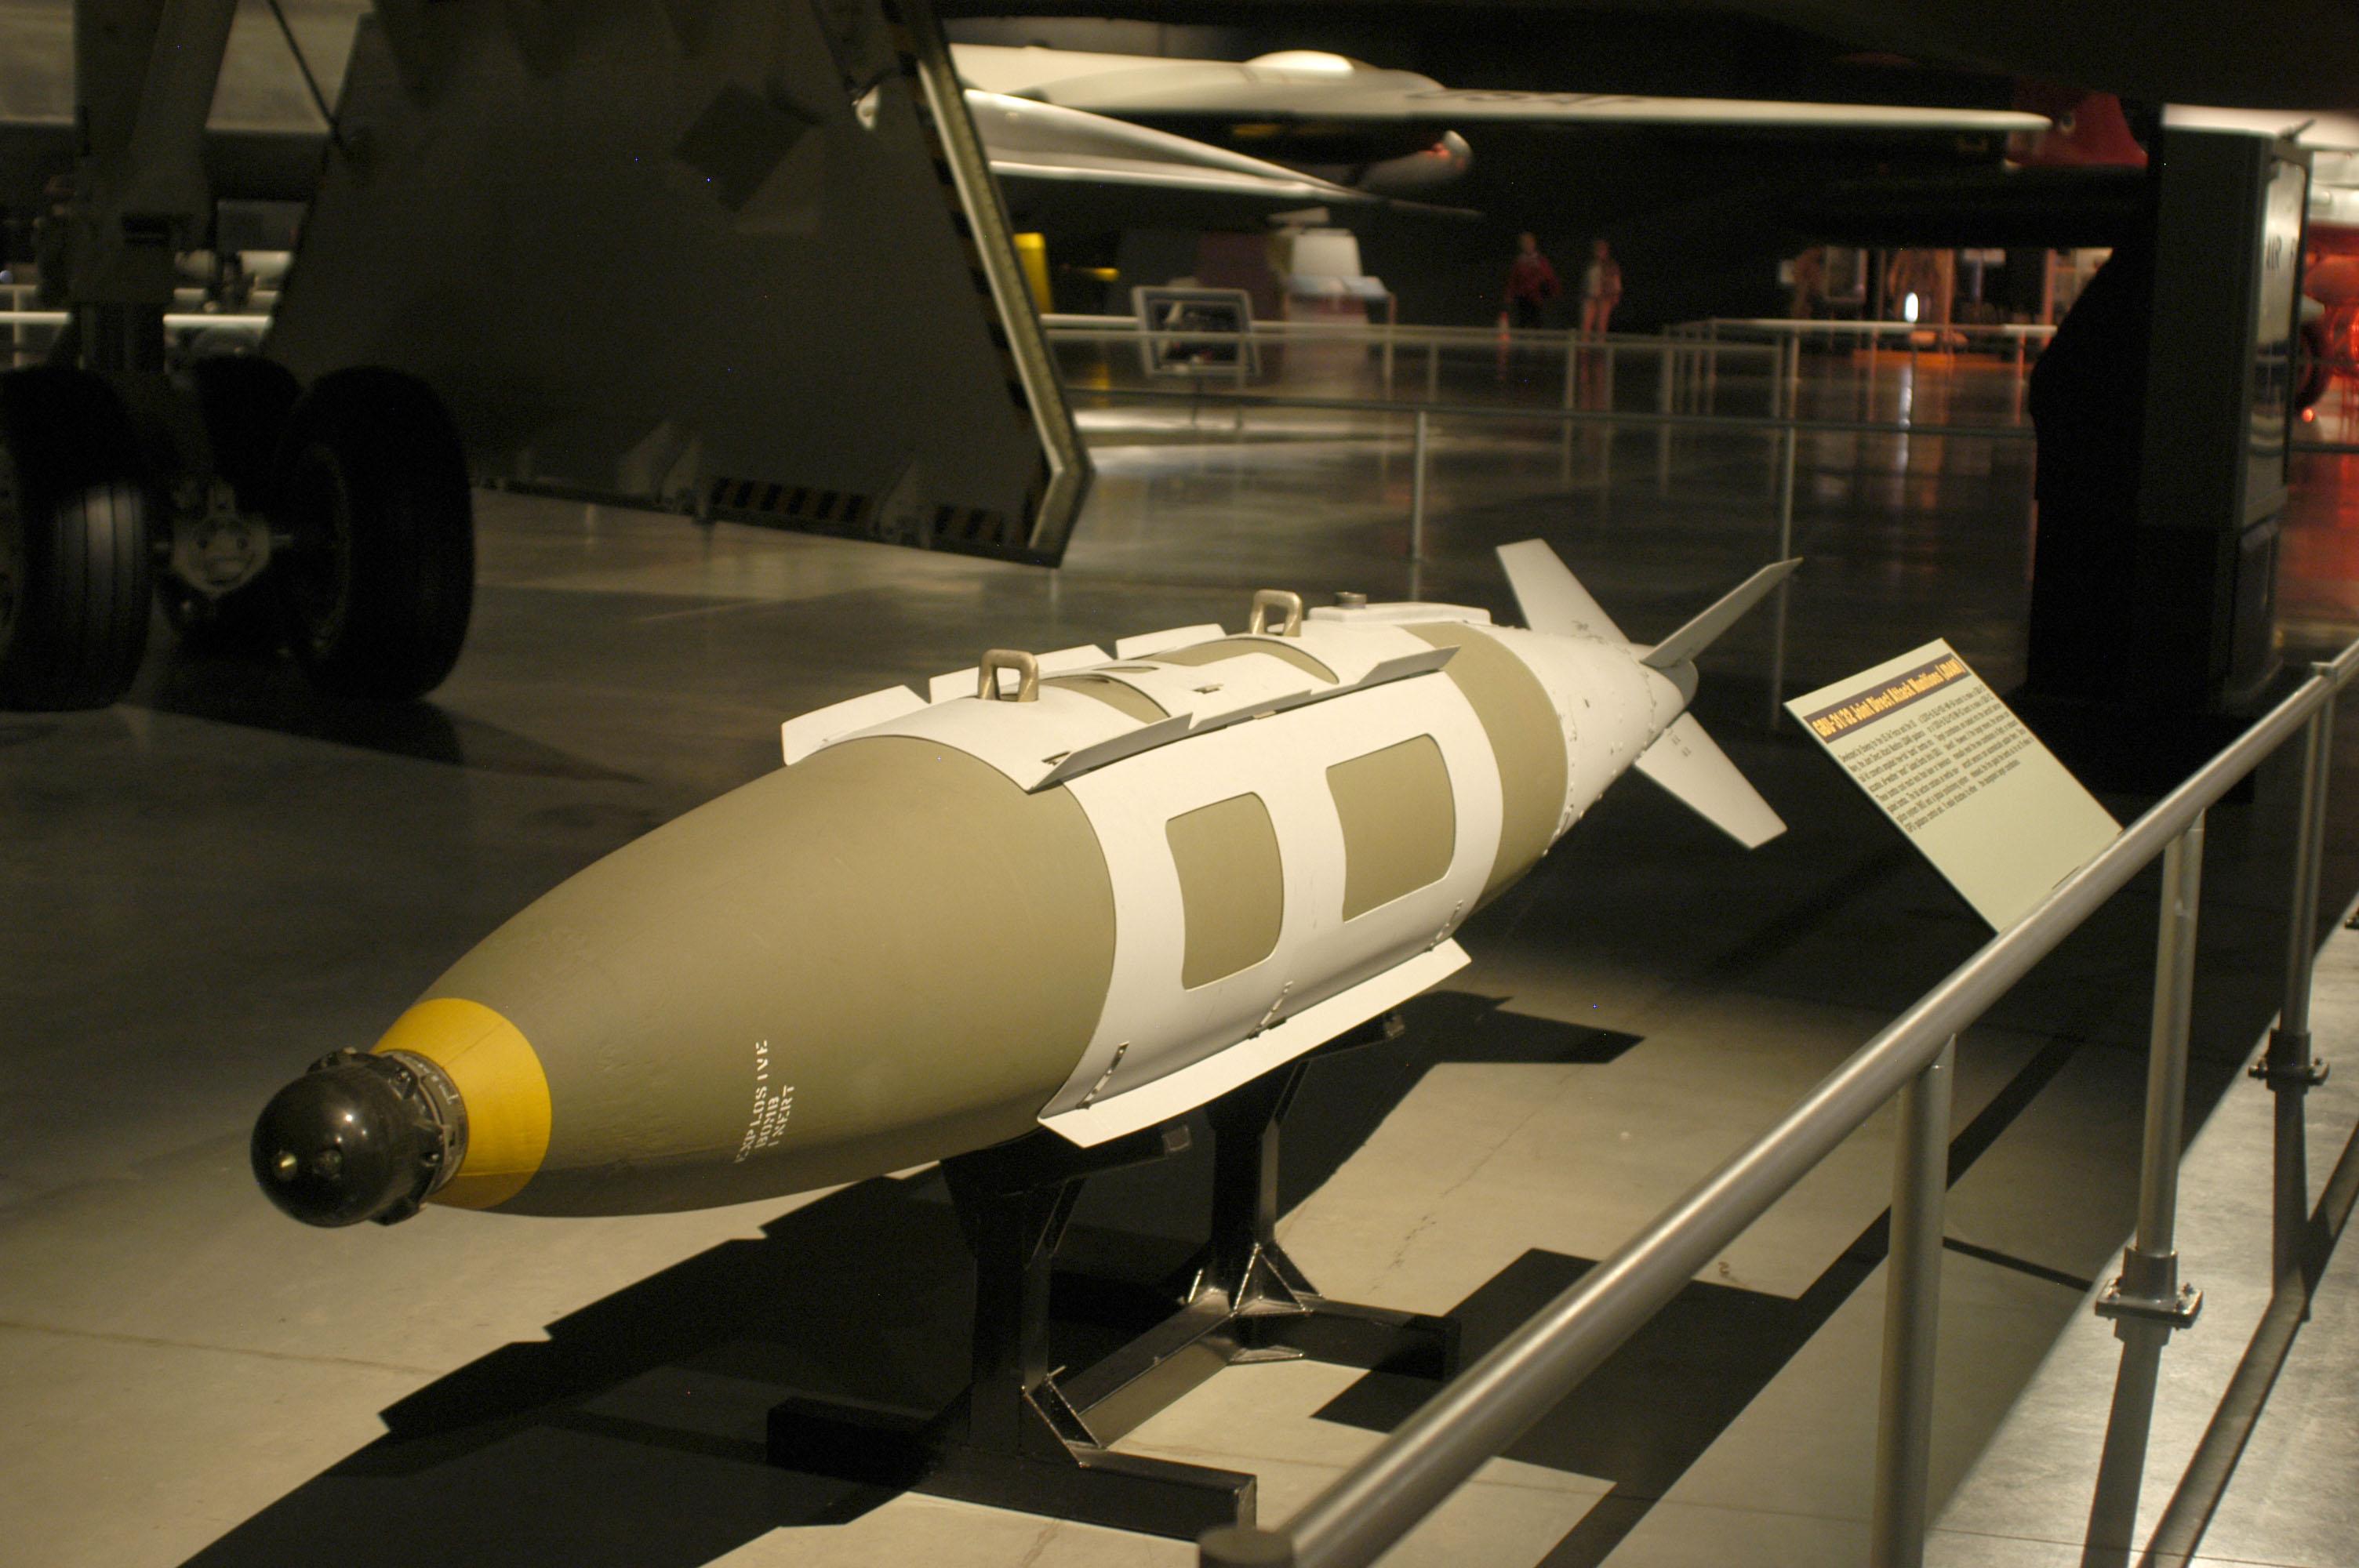 Gbu 31 32 Joint Direct Attack Munitions Jdam Gt National